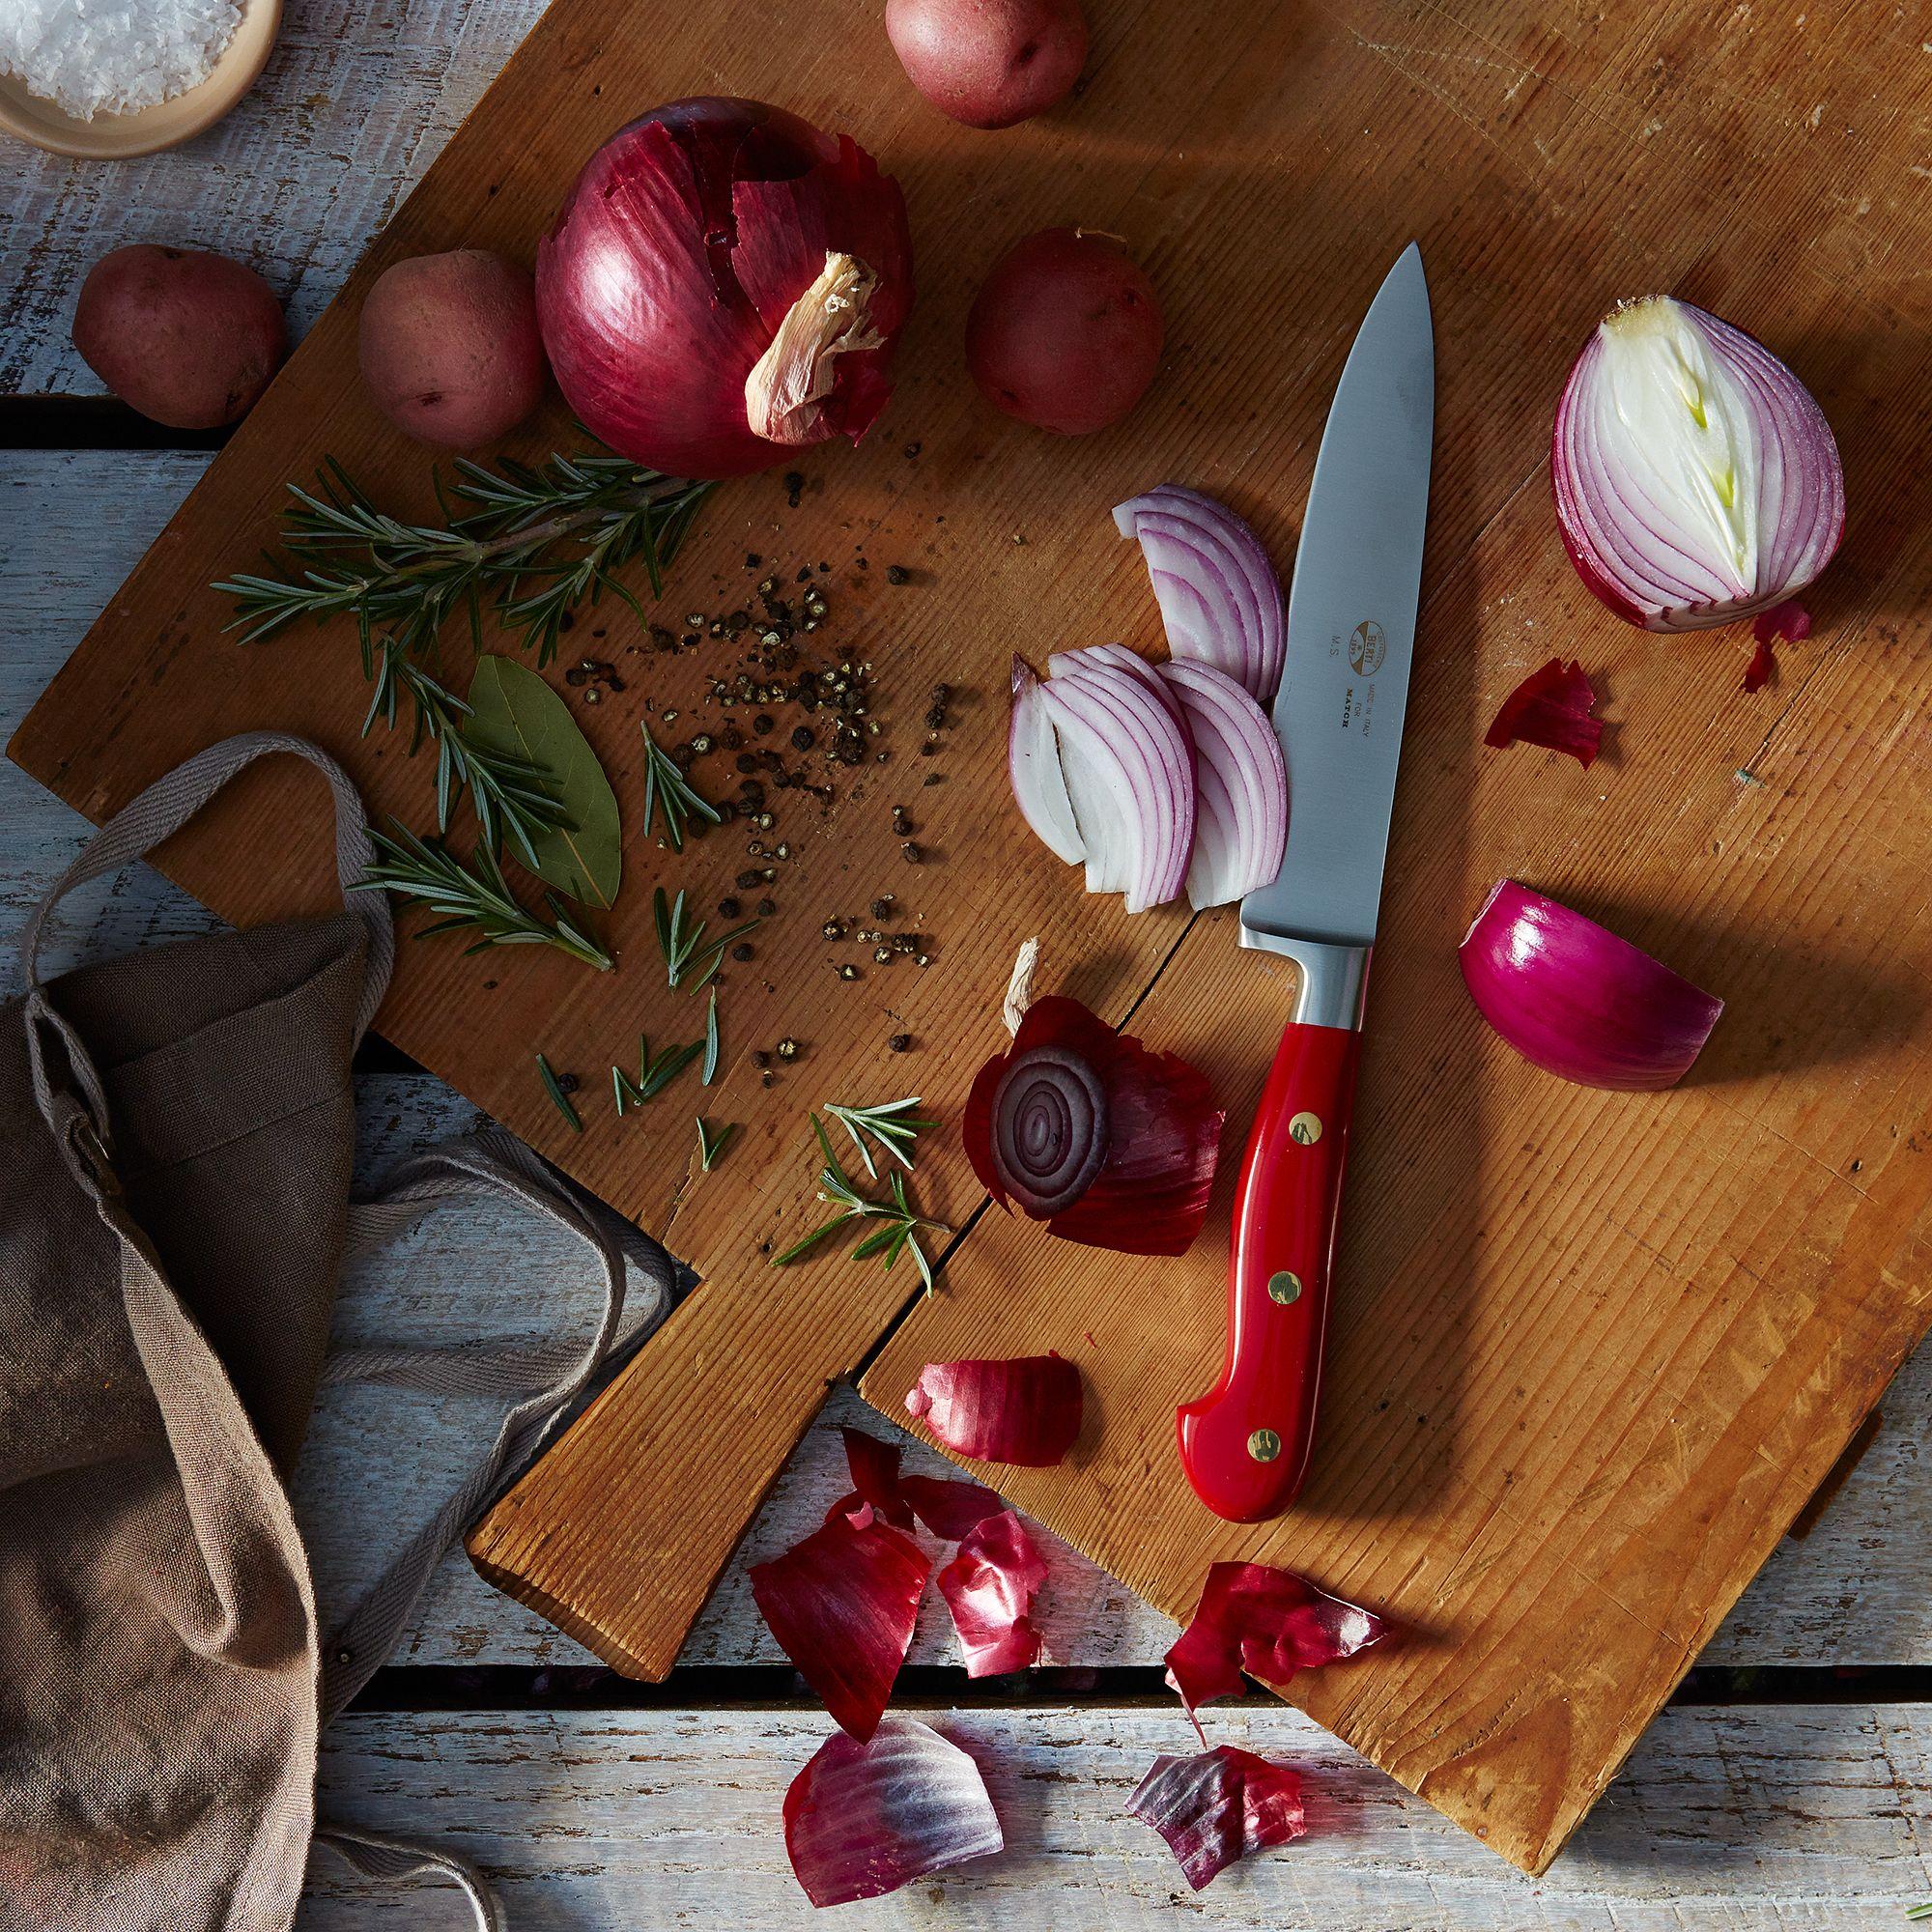 berti red handled italian kitchen knives on food52